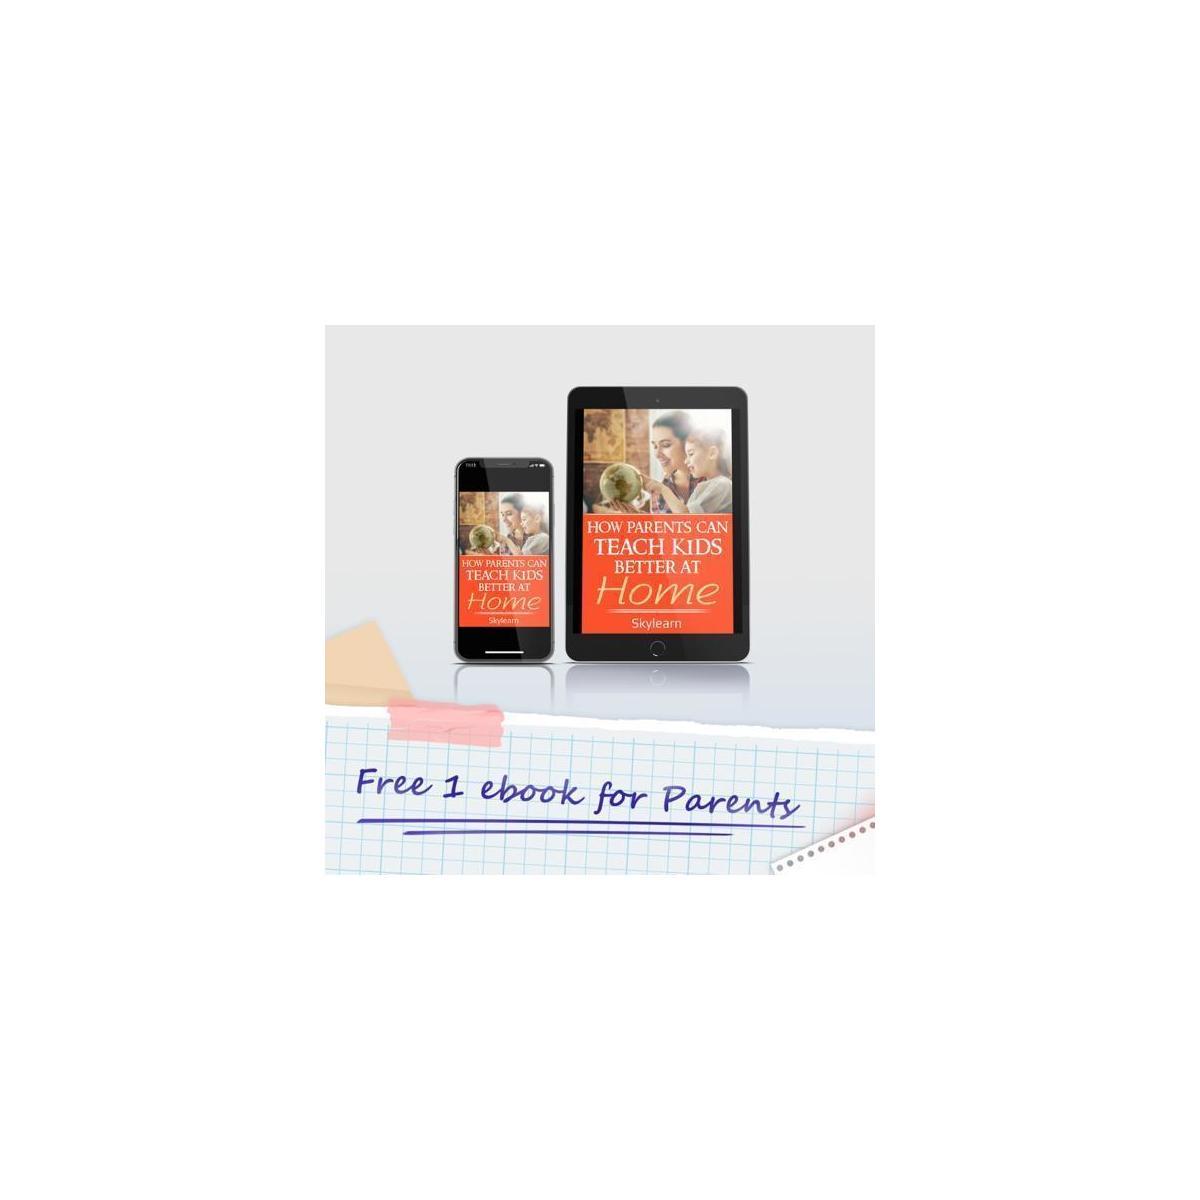 Dry Erase Pockets Pack 10 Bonus Ebook For Teaching Kids